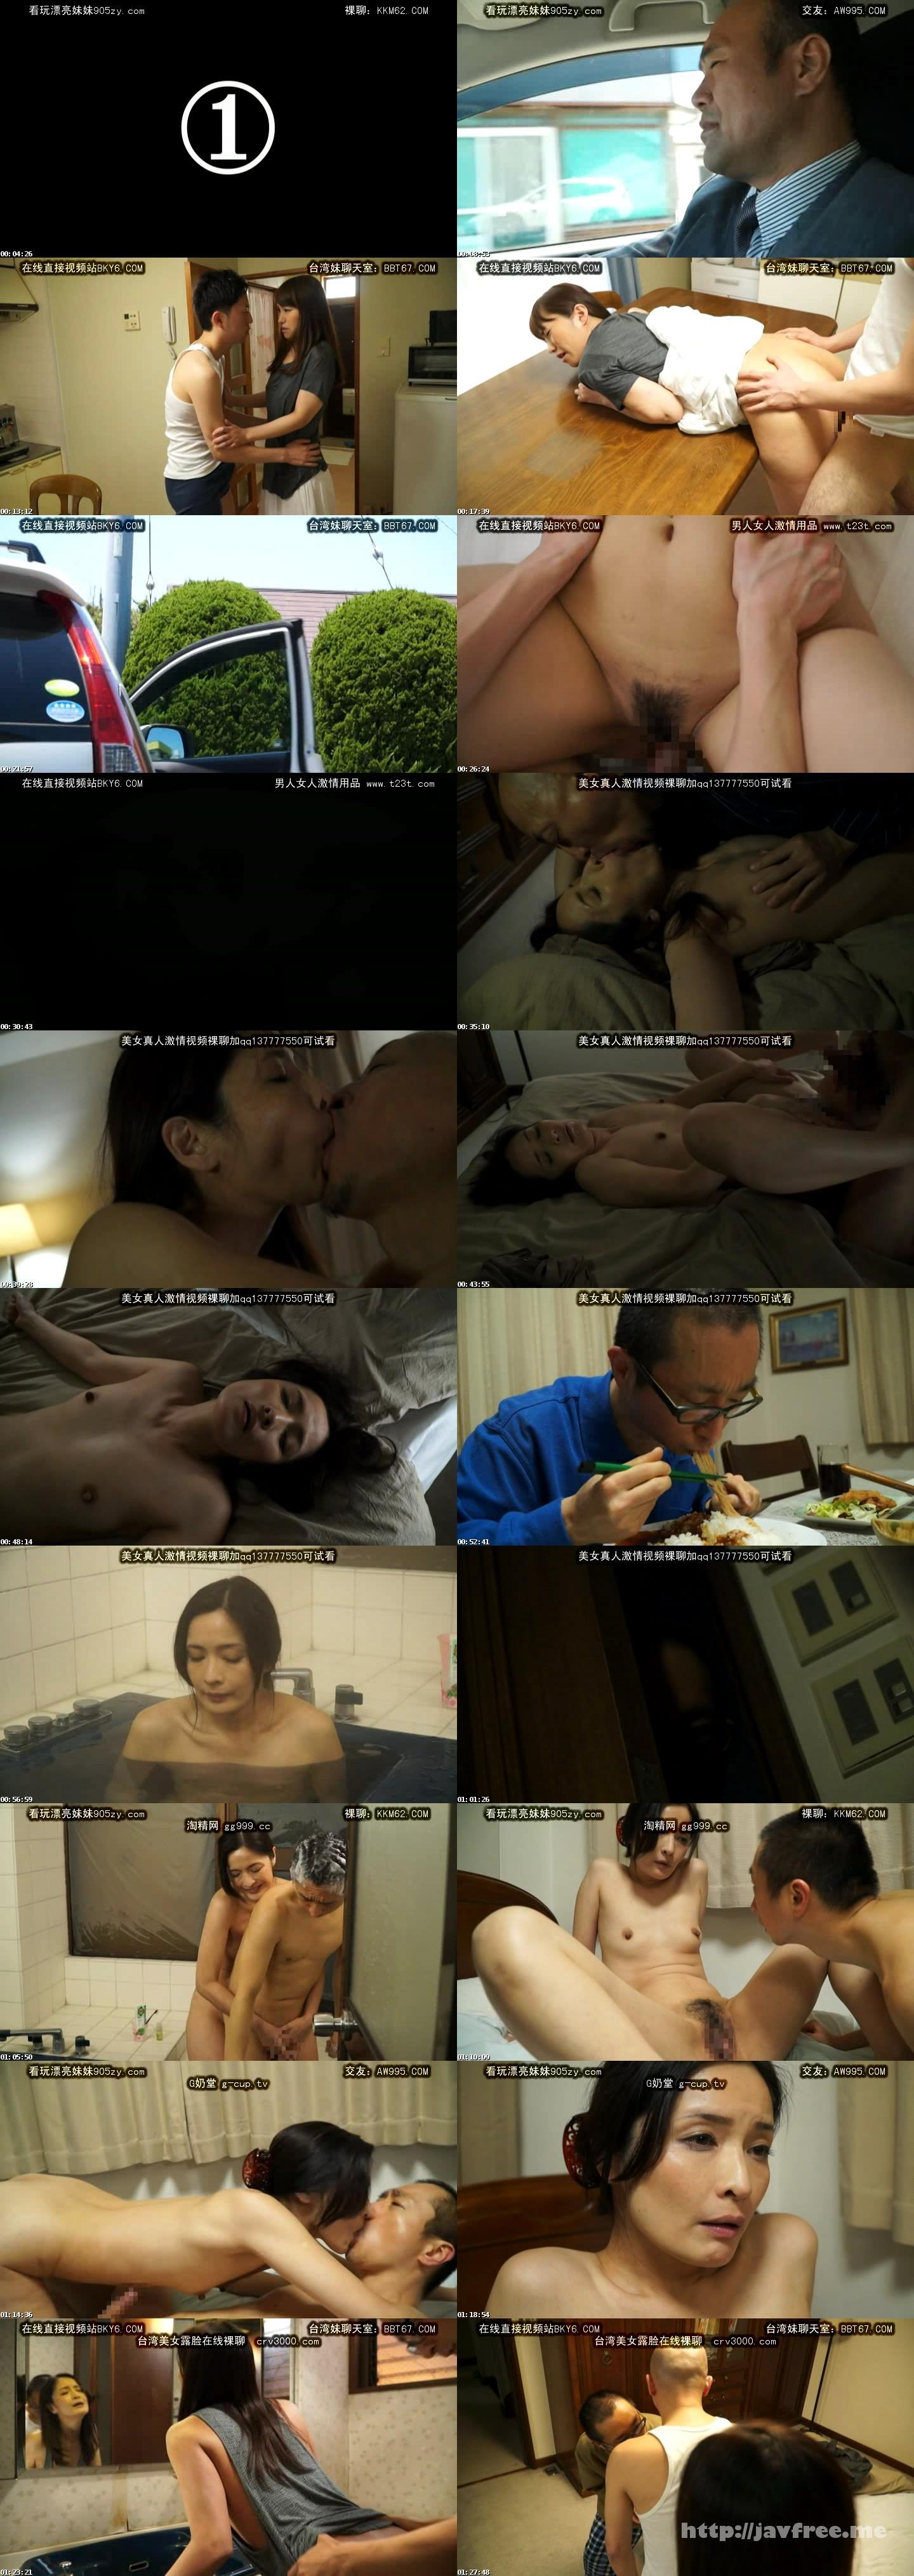 [SGRS-018] 義母狂い 寺崎泉/藤堂由香里